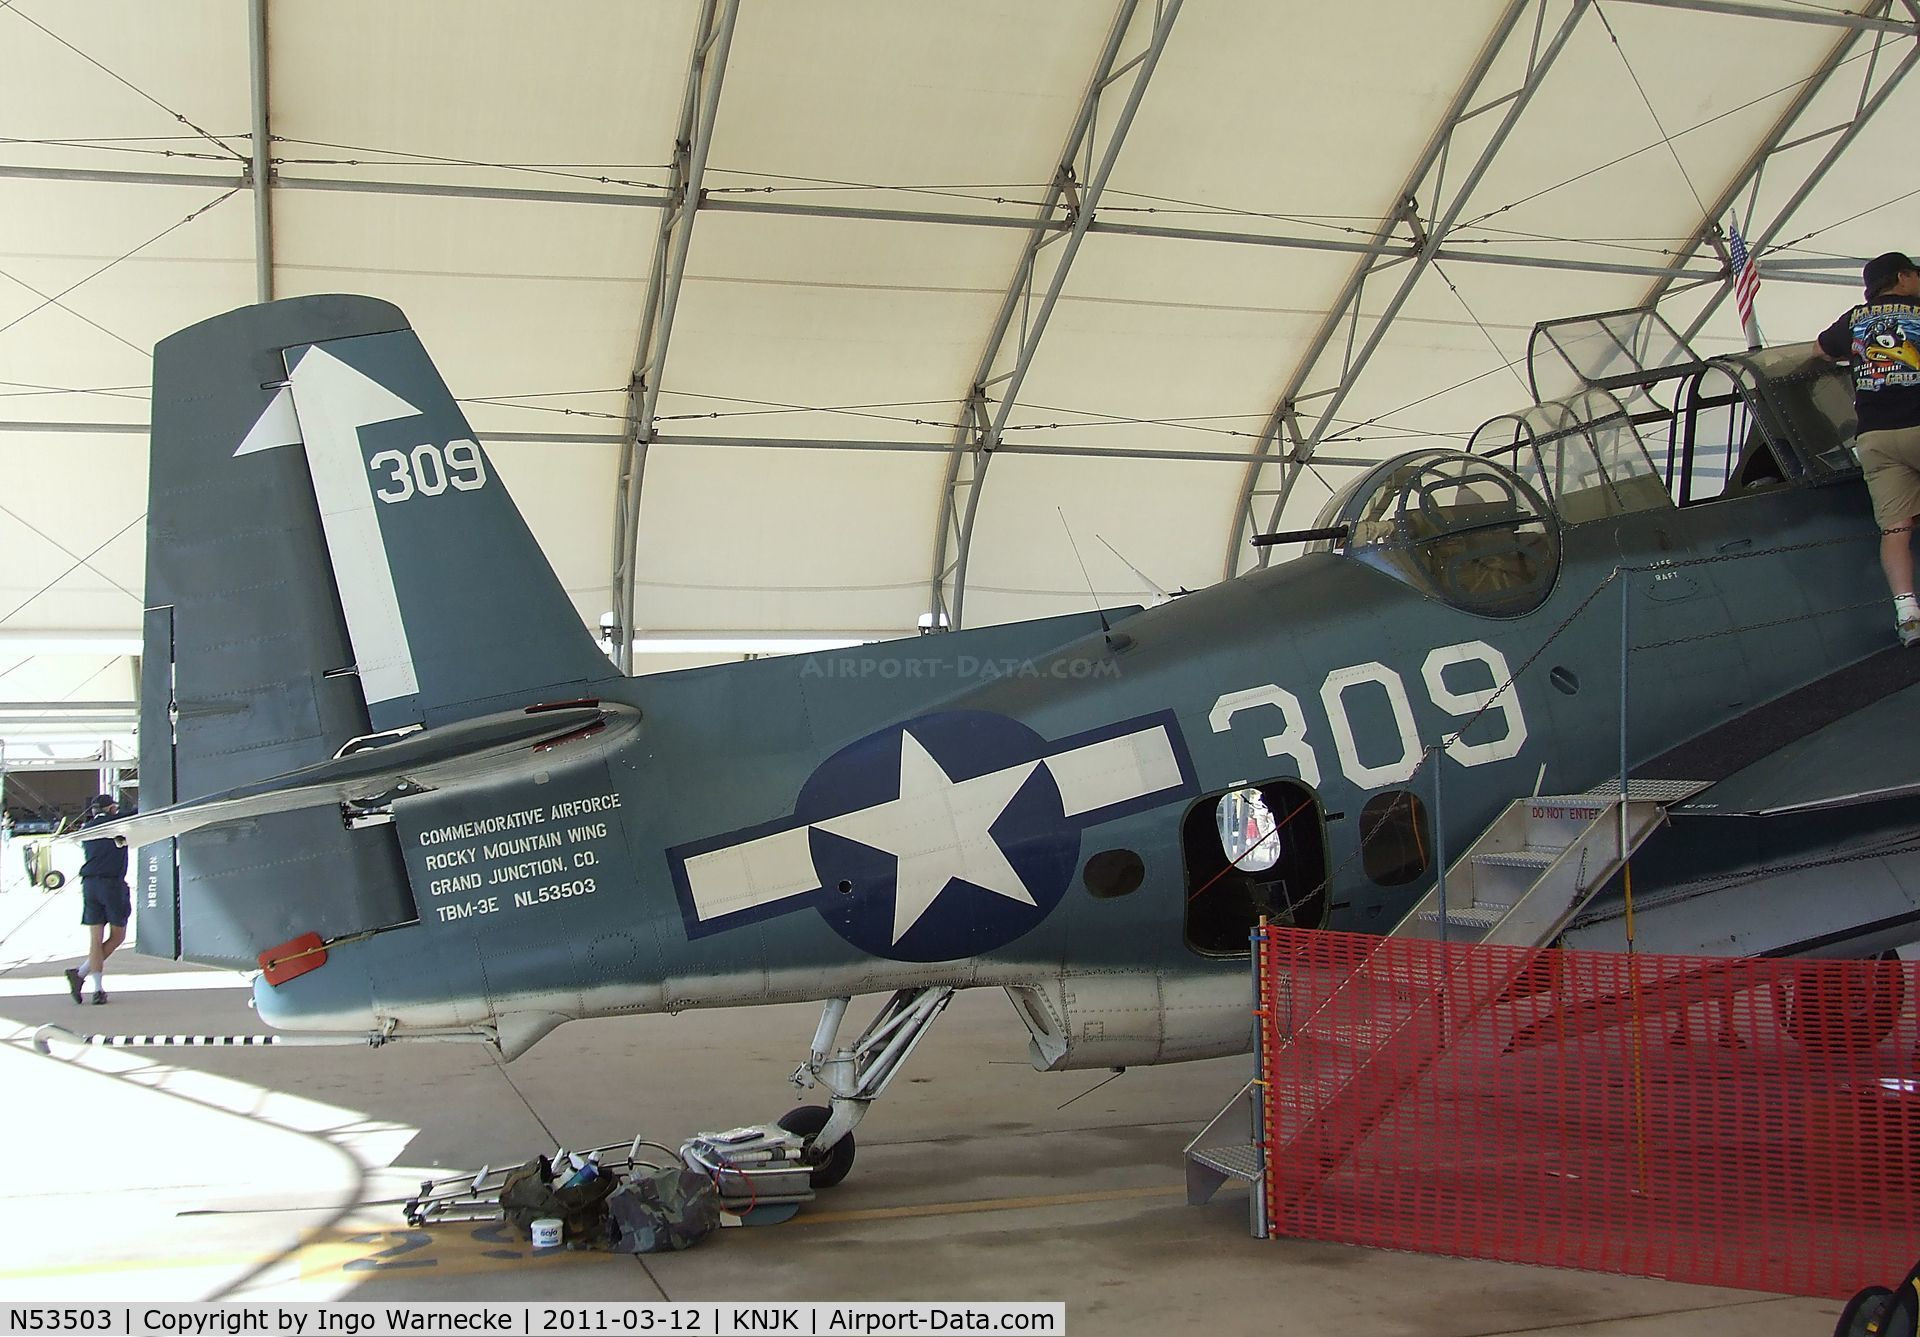 Aircraft N53503 1945 Grumman Tbm 3e Avenger C N 53503 Photo By Ingo Warnecke Photo Id Ac653928